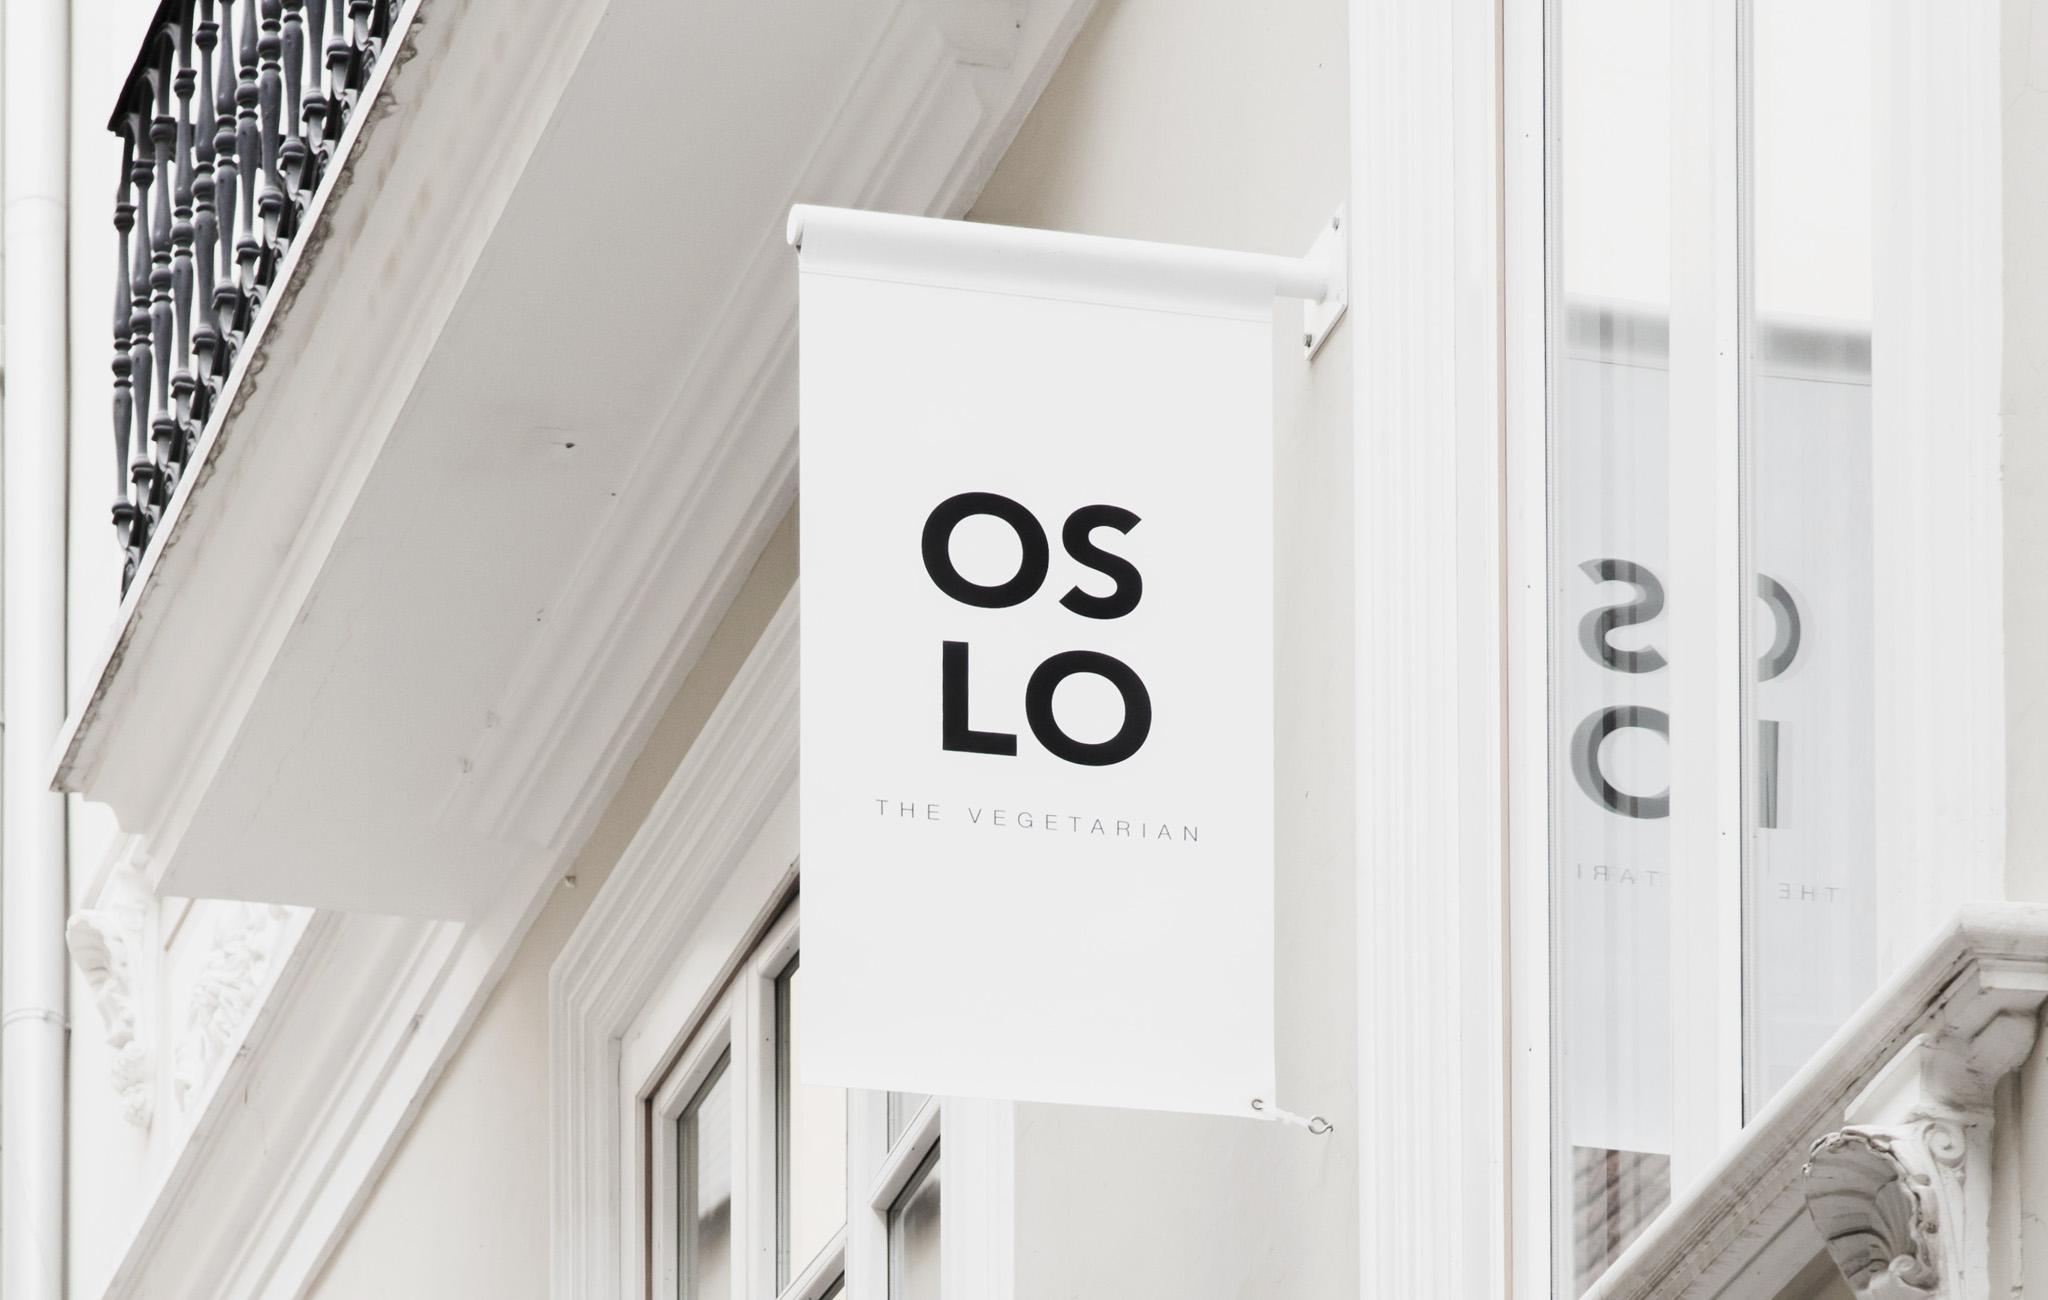 Oslo Restaurant